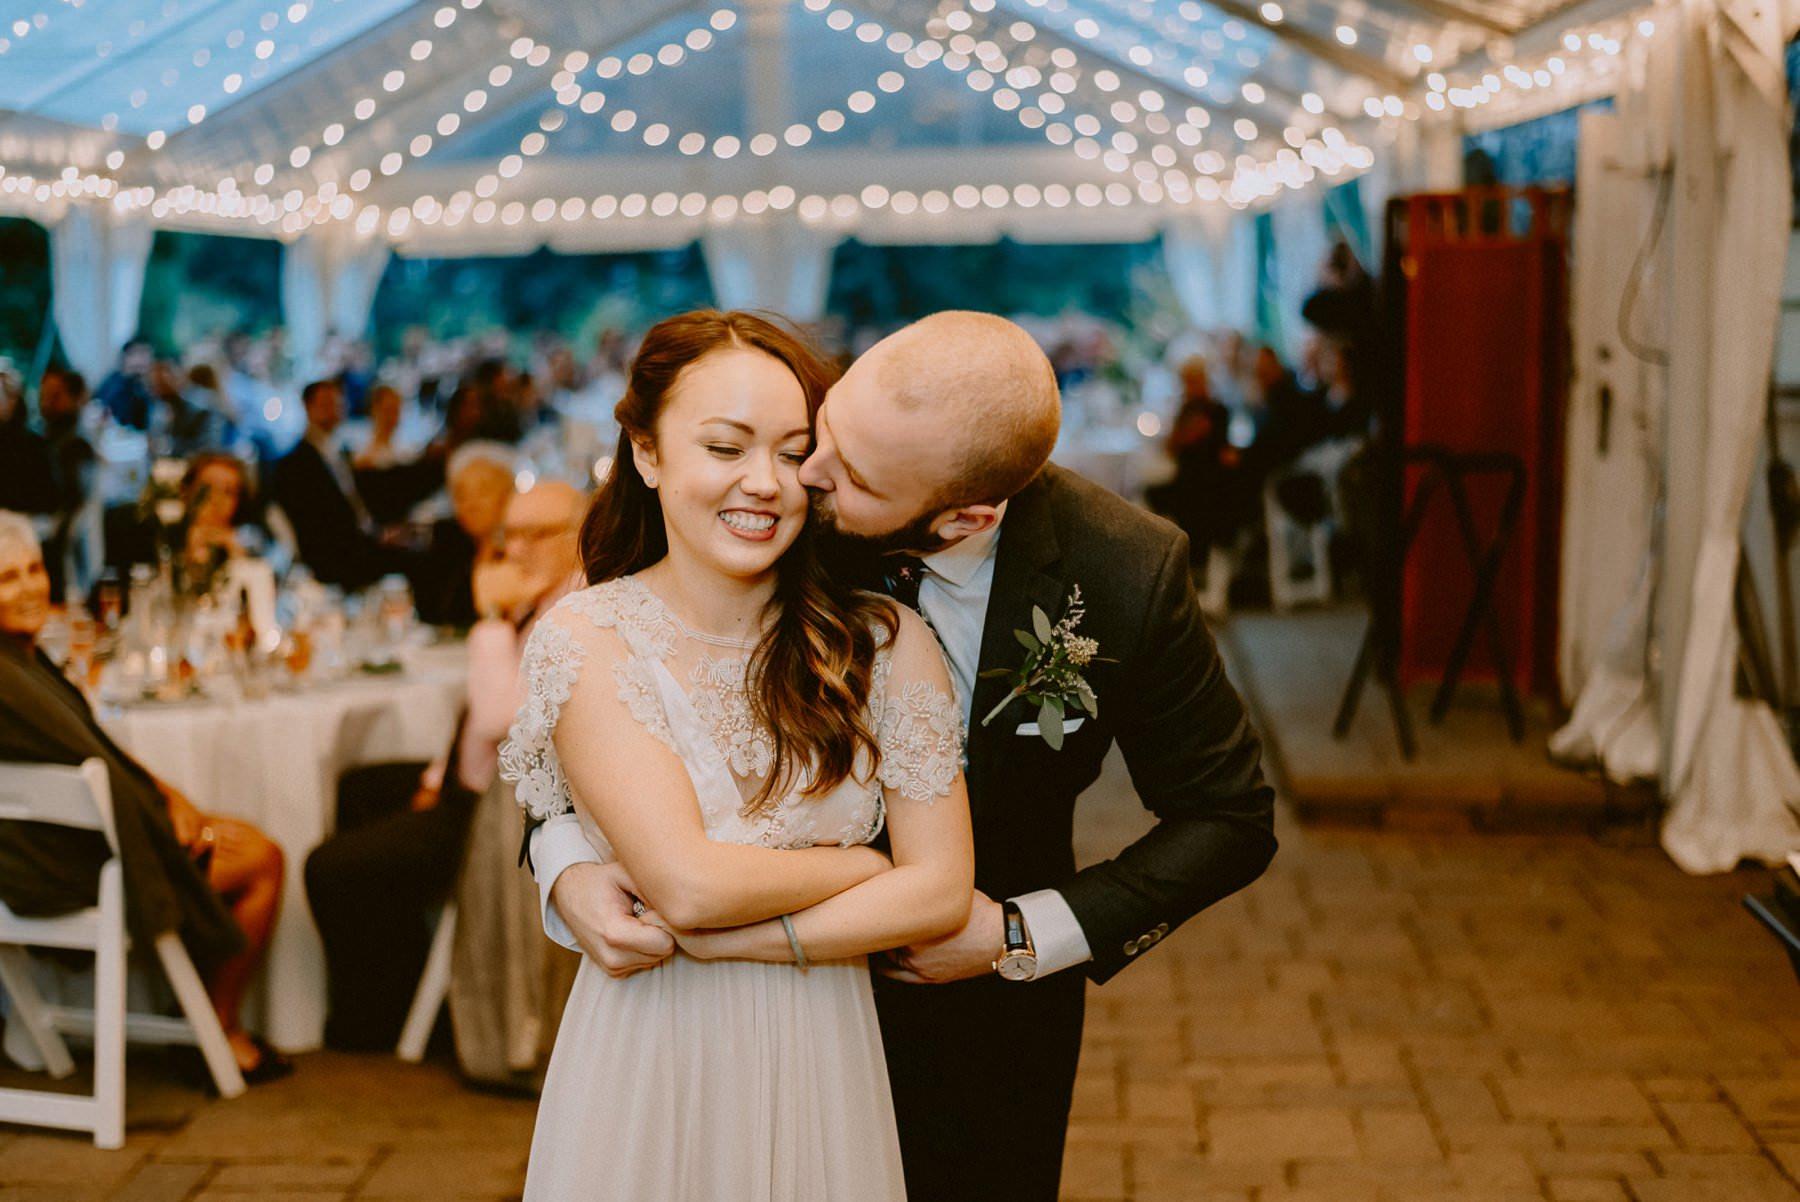 Tyler_arboretum_wedding-081.jpg